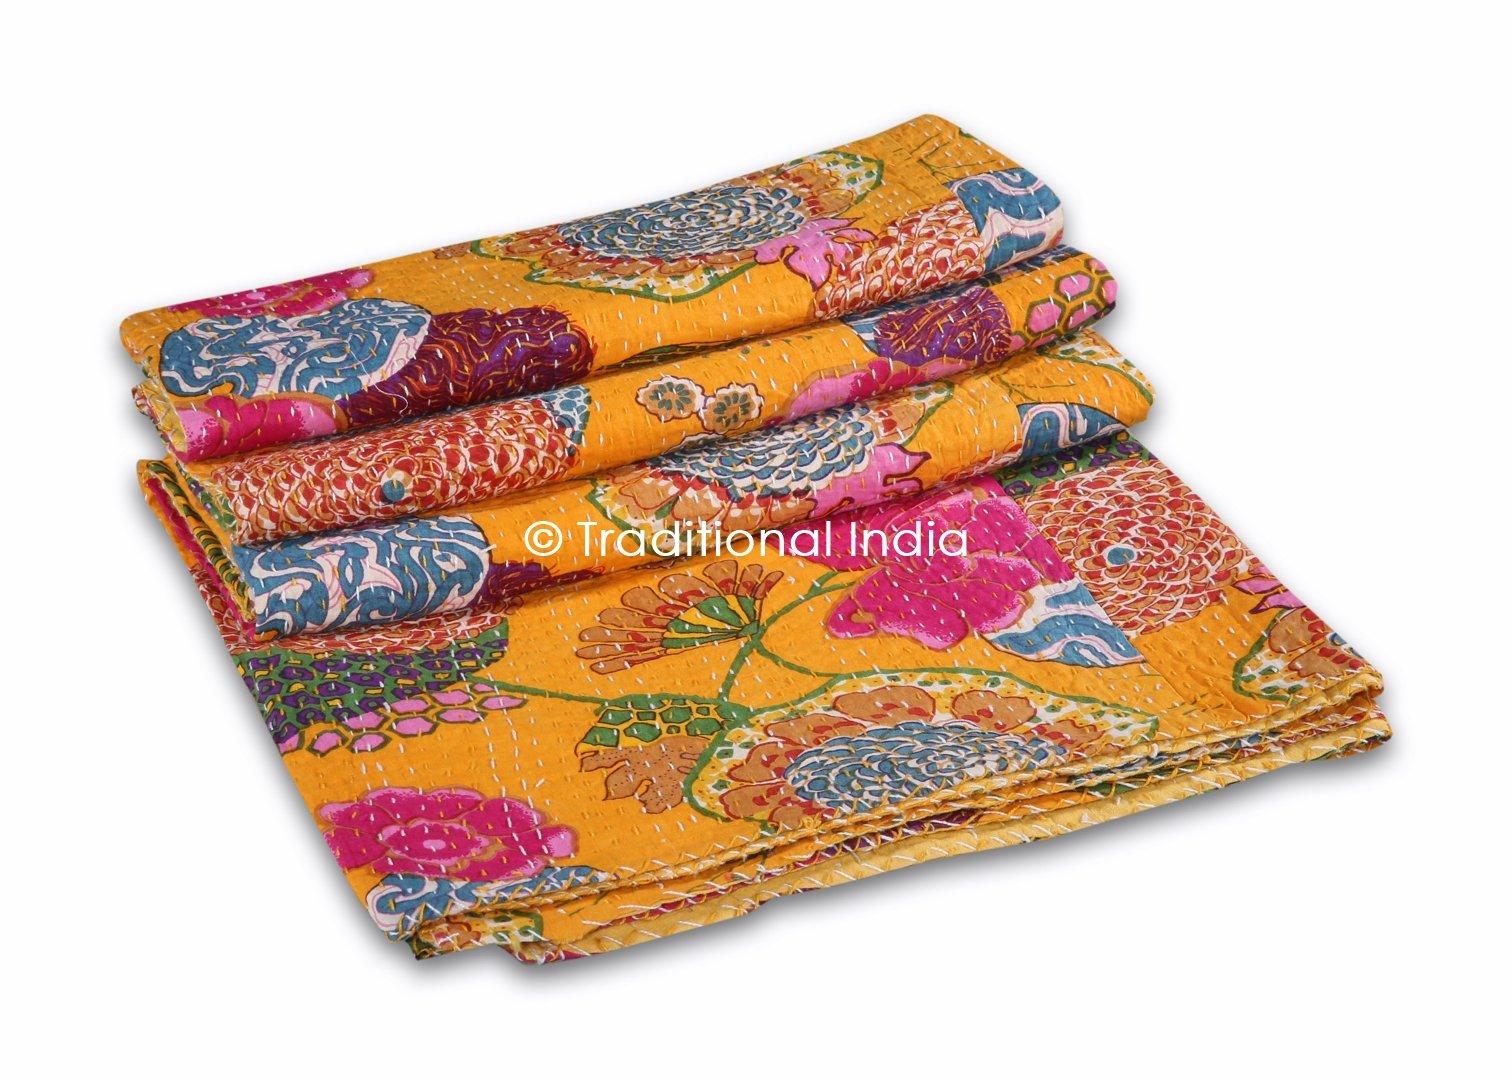 Indian kantha Quilt Throw, Fruit Print Kantha Gudri,Reversible Bedspread,Vintage Bedding Gudri Ralli Decor,Queen Size Bedspread 90x108''